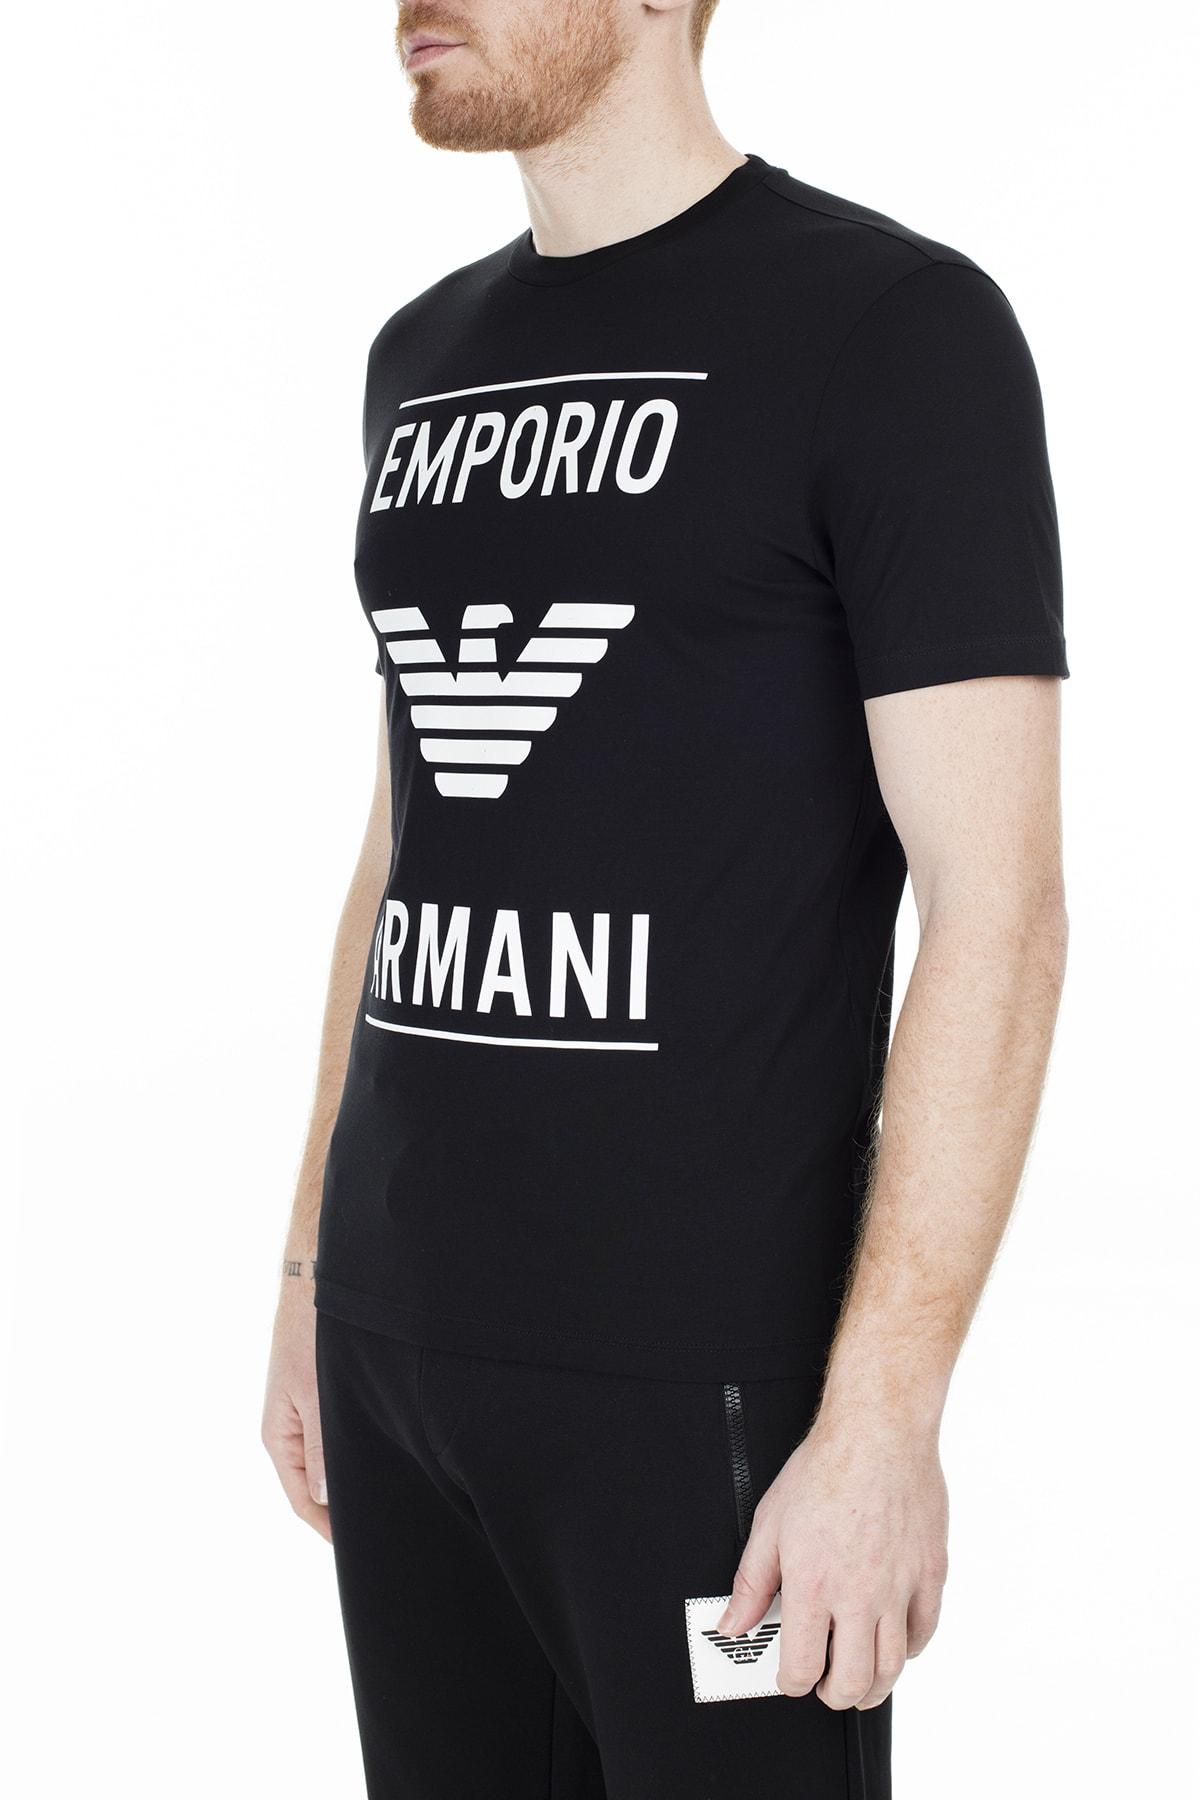 Emporio Armani T Shirt Erkek T Shirt S 6G1Te7 1Jnqz 0999 S 6G1TE7 1JNQZ 0999 2